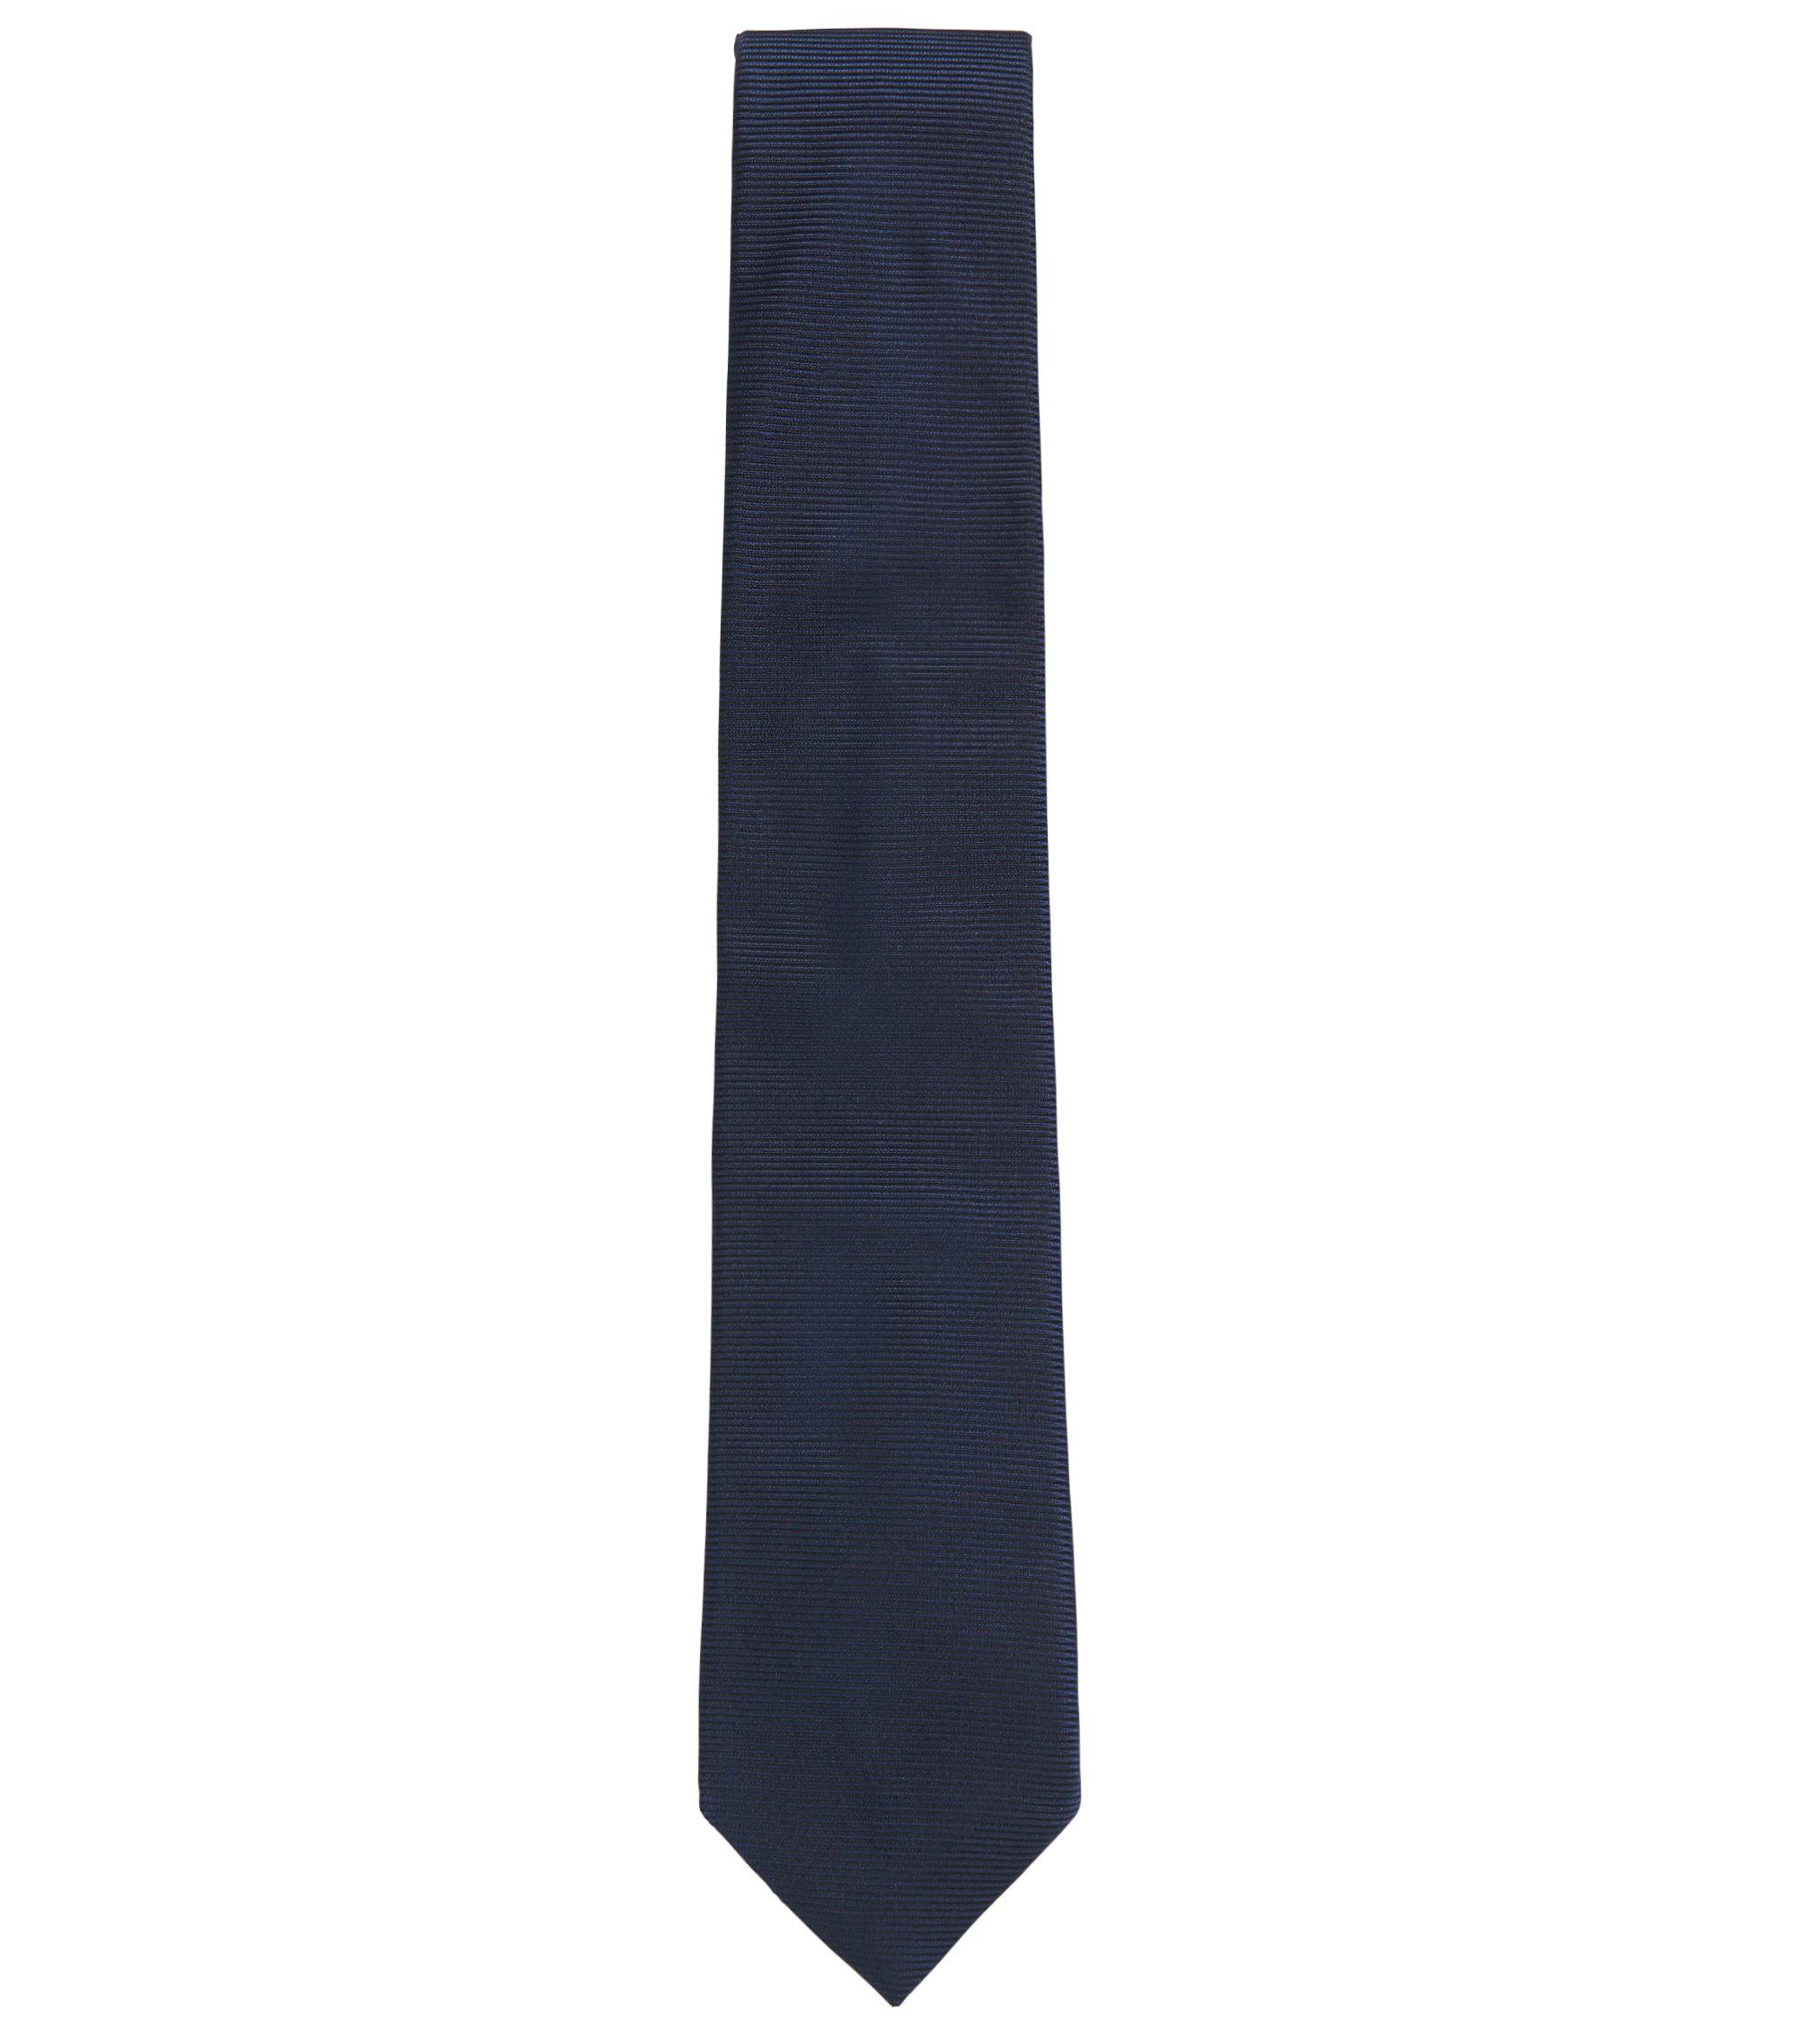 Krawatte aus italienischer Jacquard-Seide, Dunkelblau